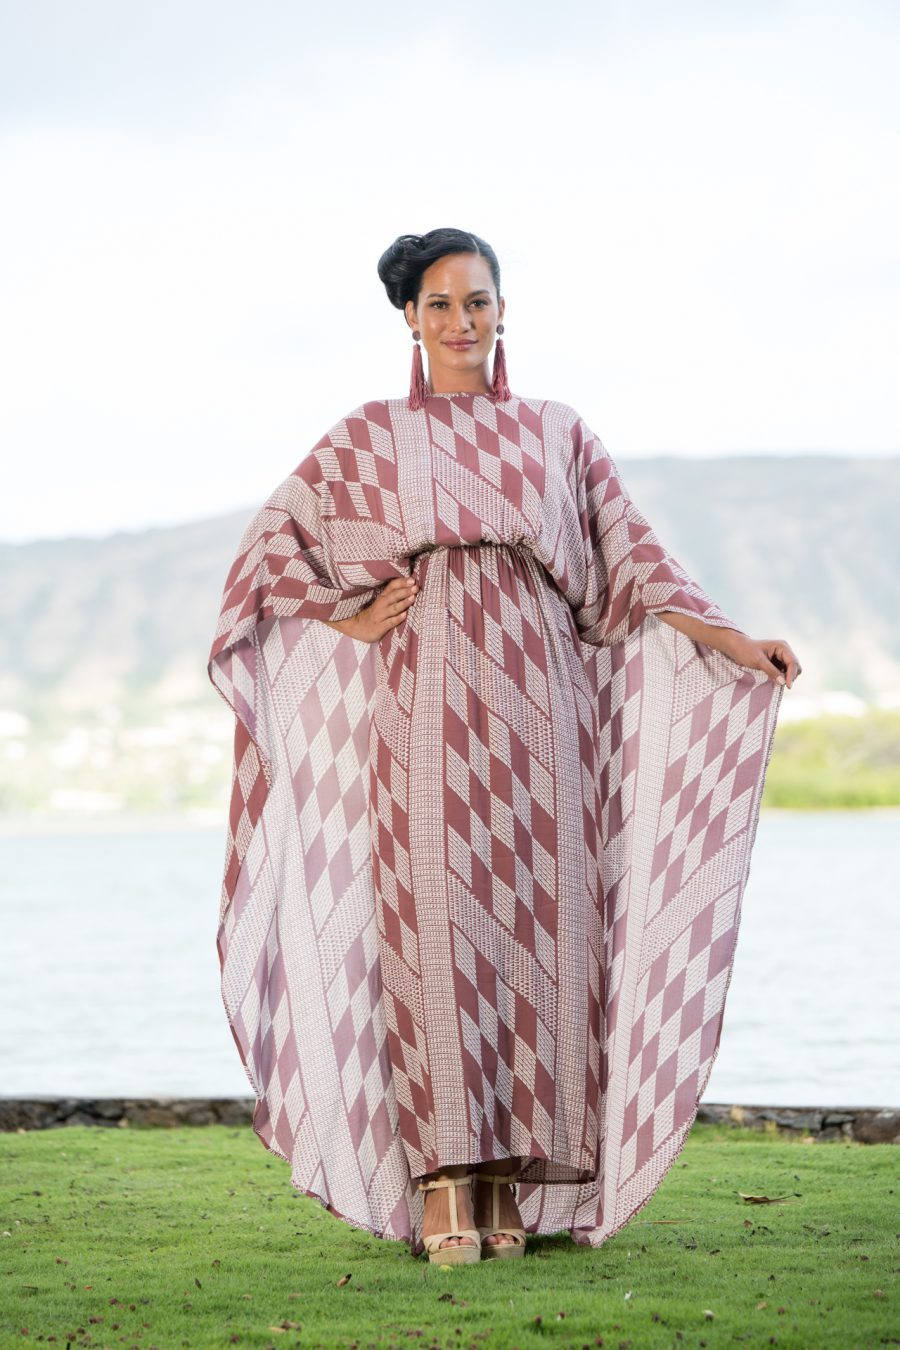 Model wearing Manu O'O Dress in Fired Brick-White Kamehahema Pattern - Front View